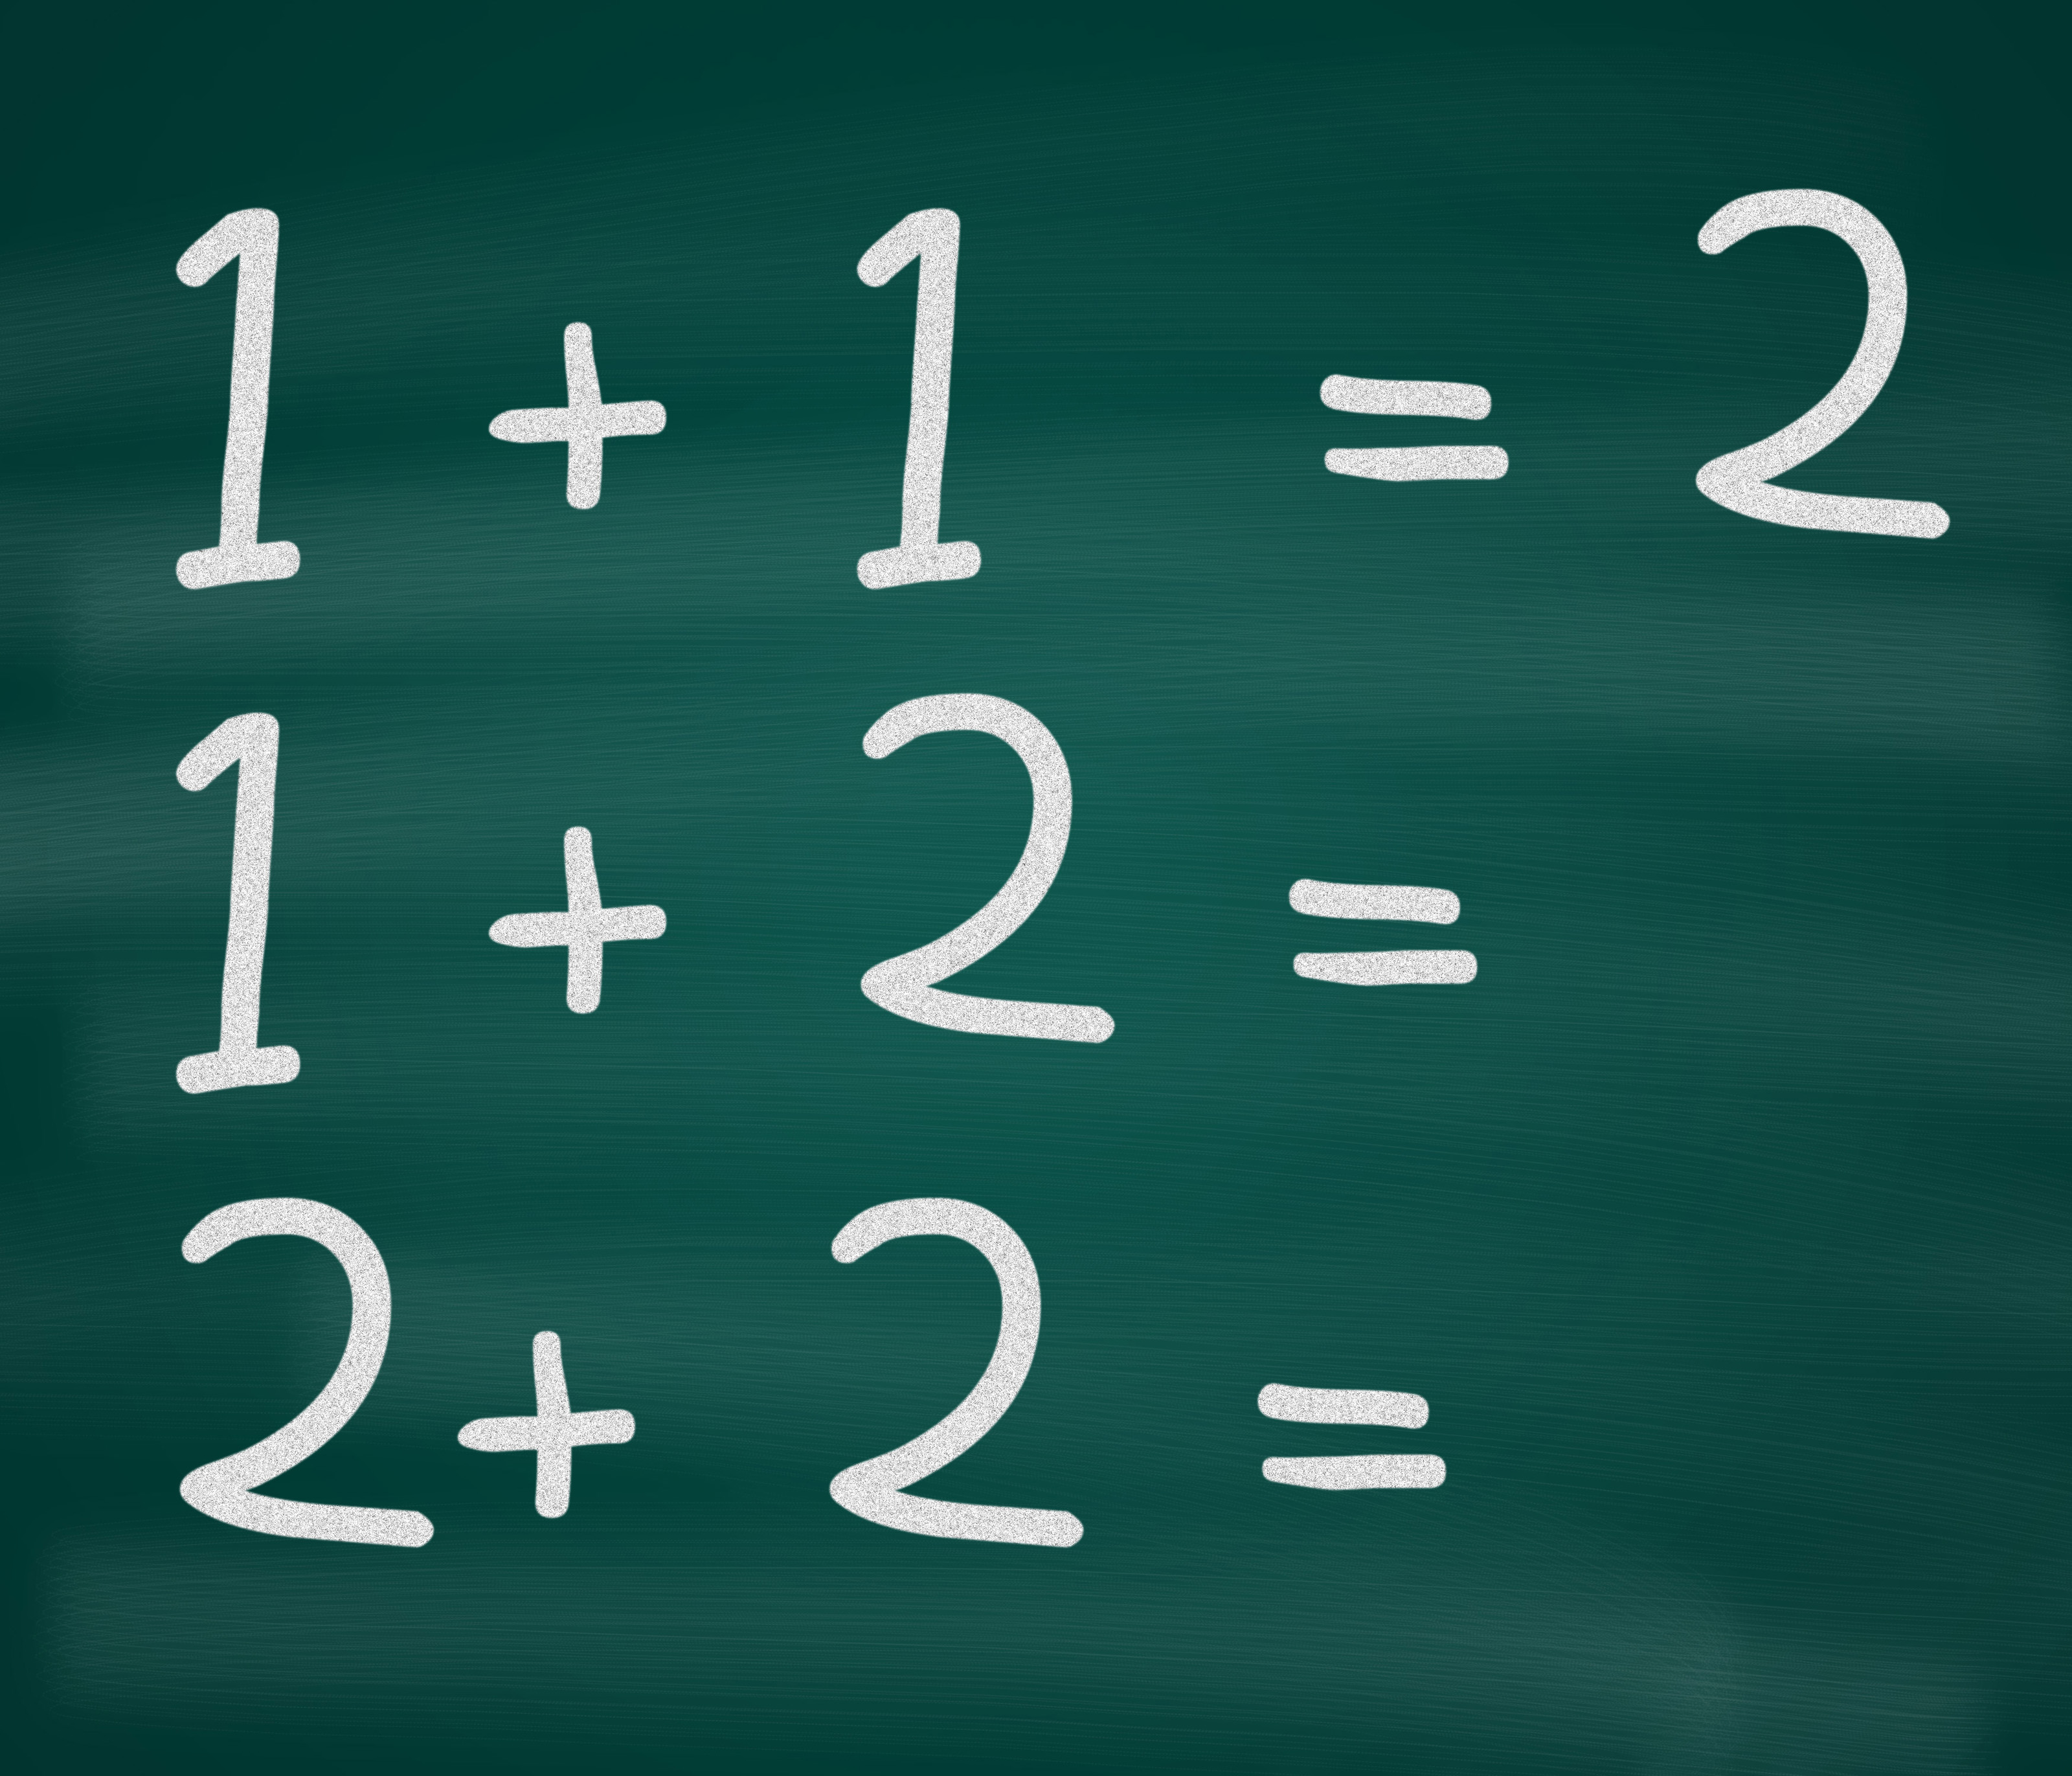 Worksheet Simple Math simple math scalien scalien